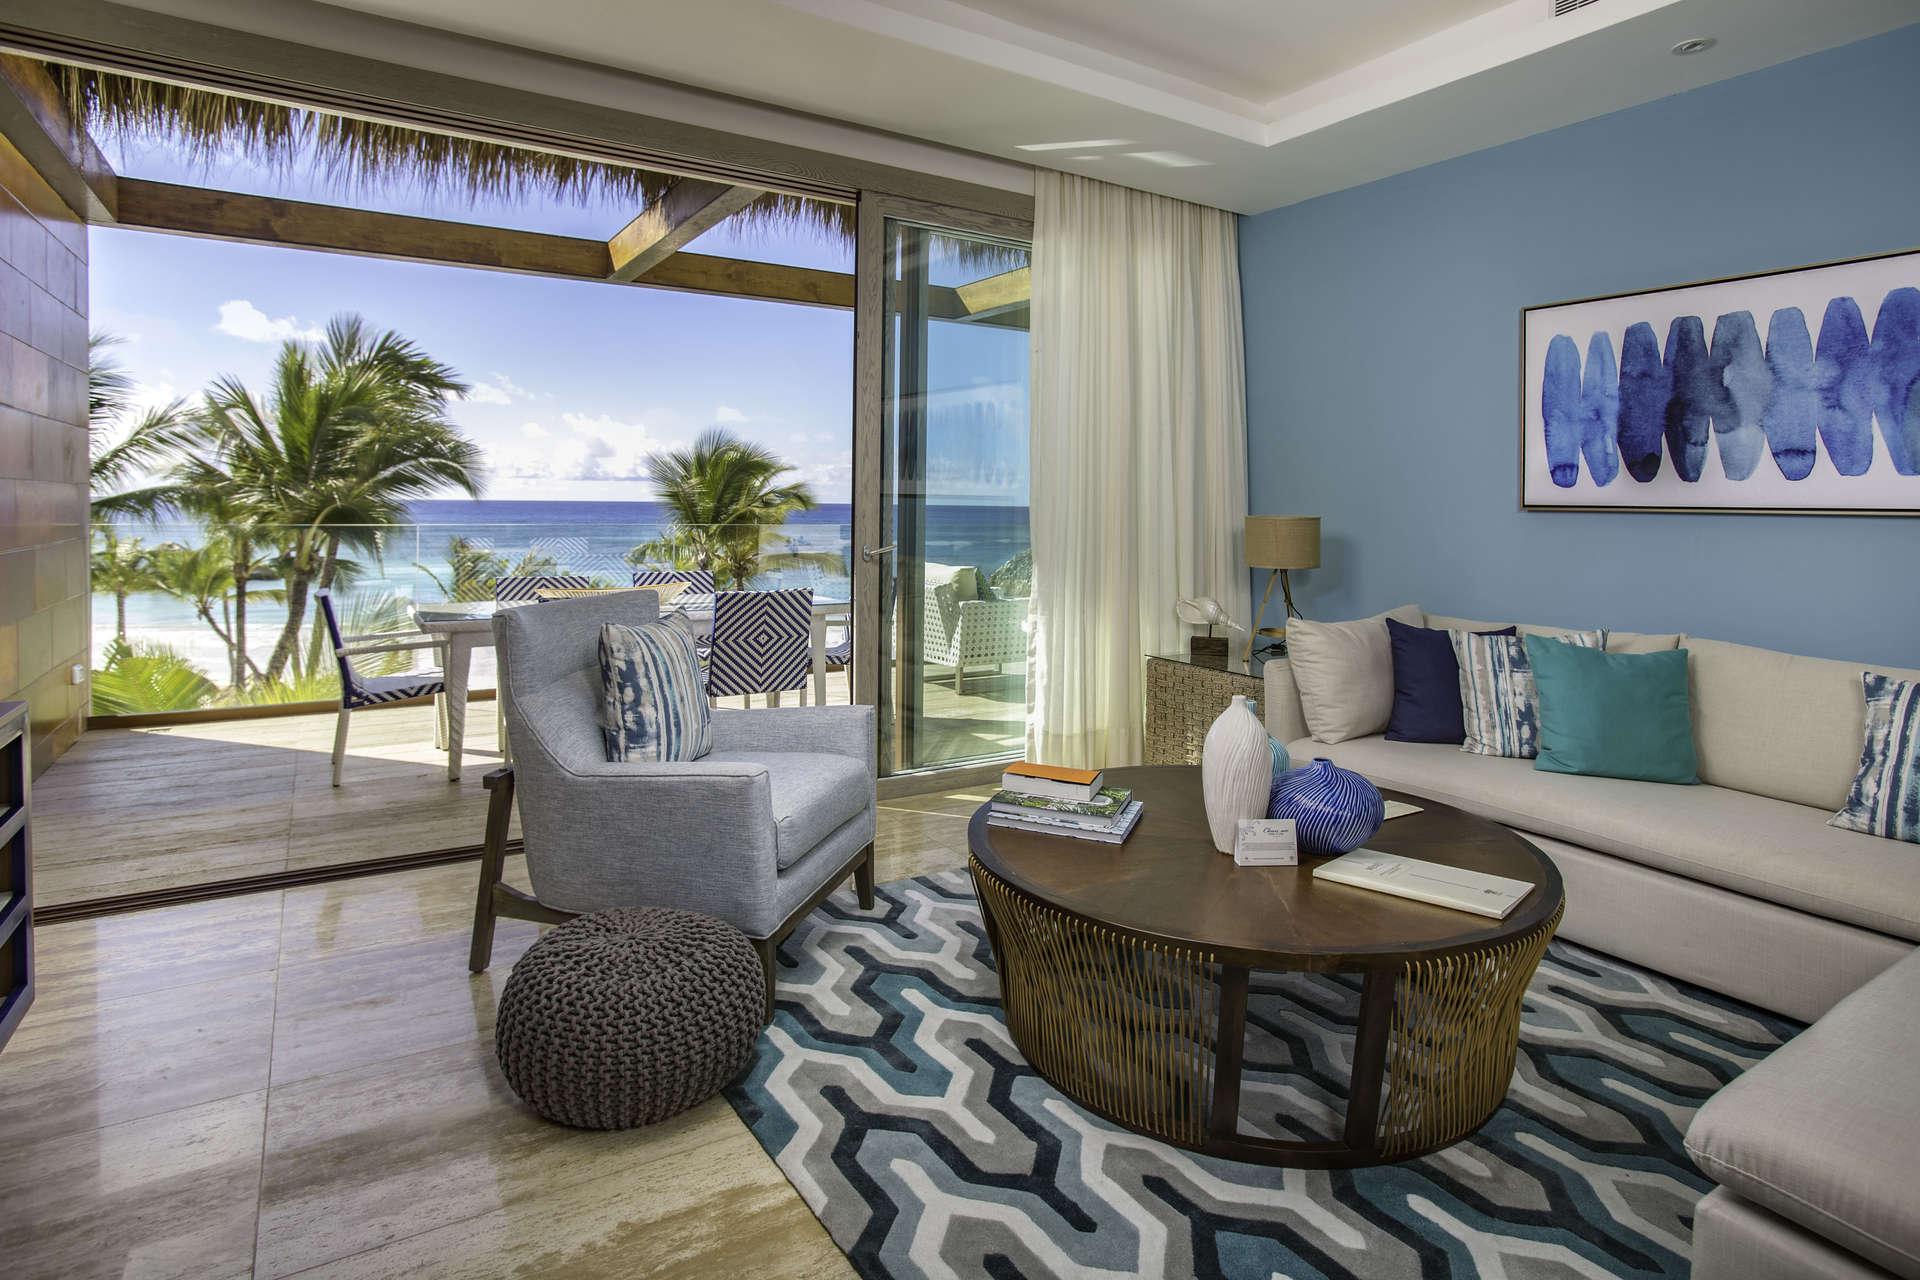 Luxury villa rentals caribbean - Dominican republic - Punta cana - Eden roc at cap cana - 2 BDM Beach - Image 1/8